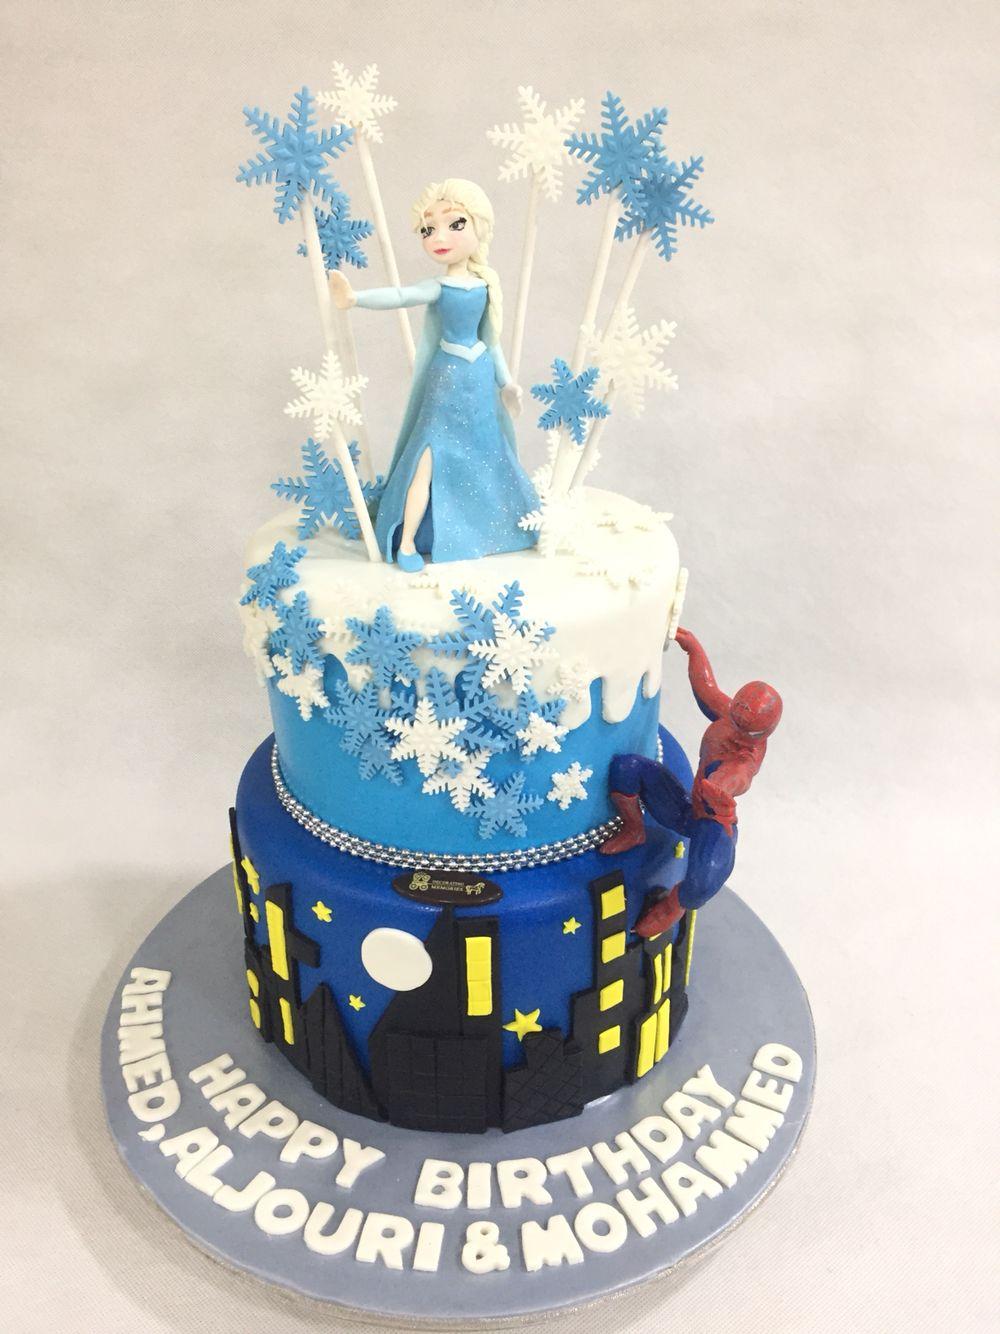 Elsa spidey with images cake designs birthday cake